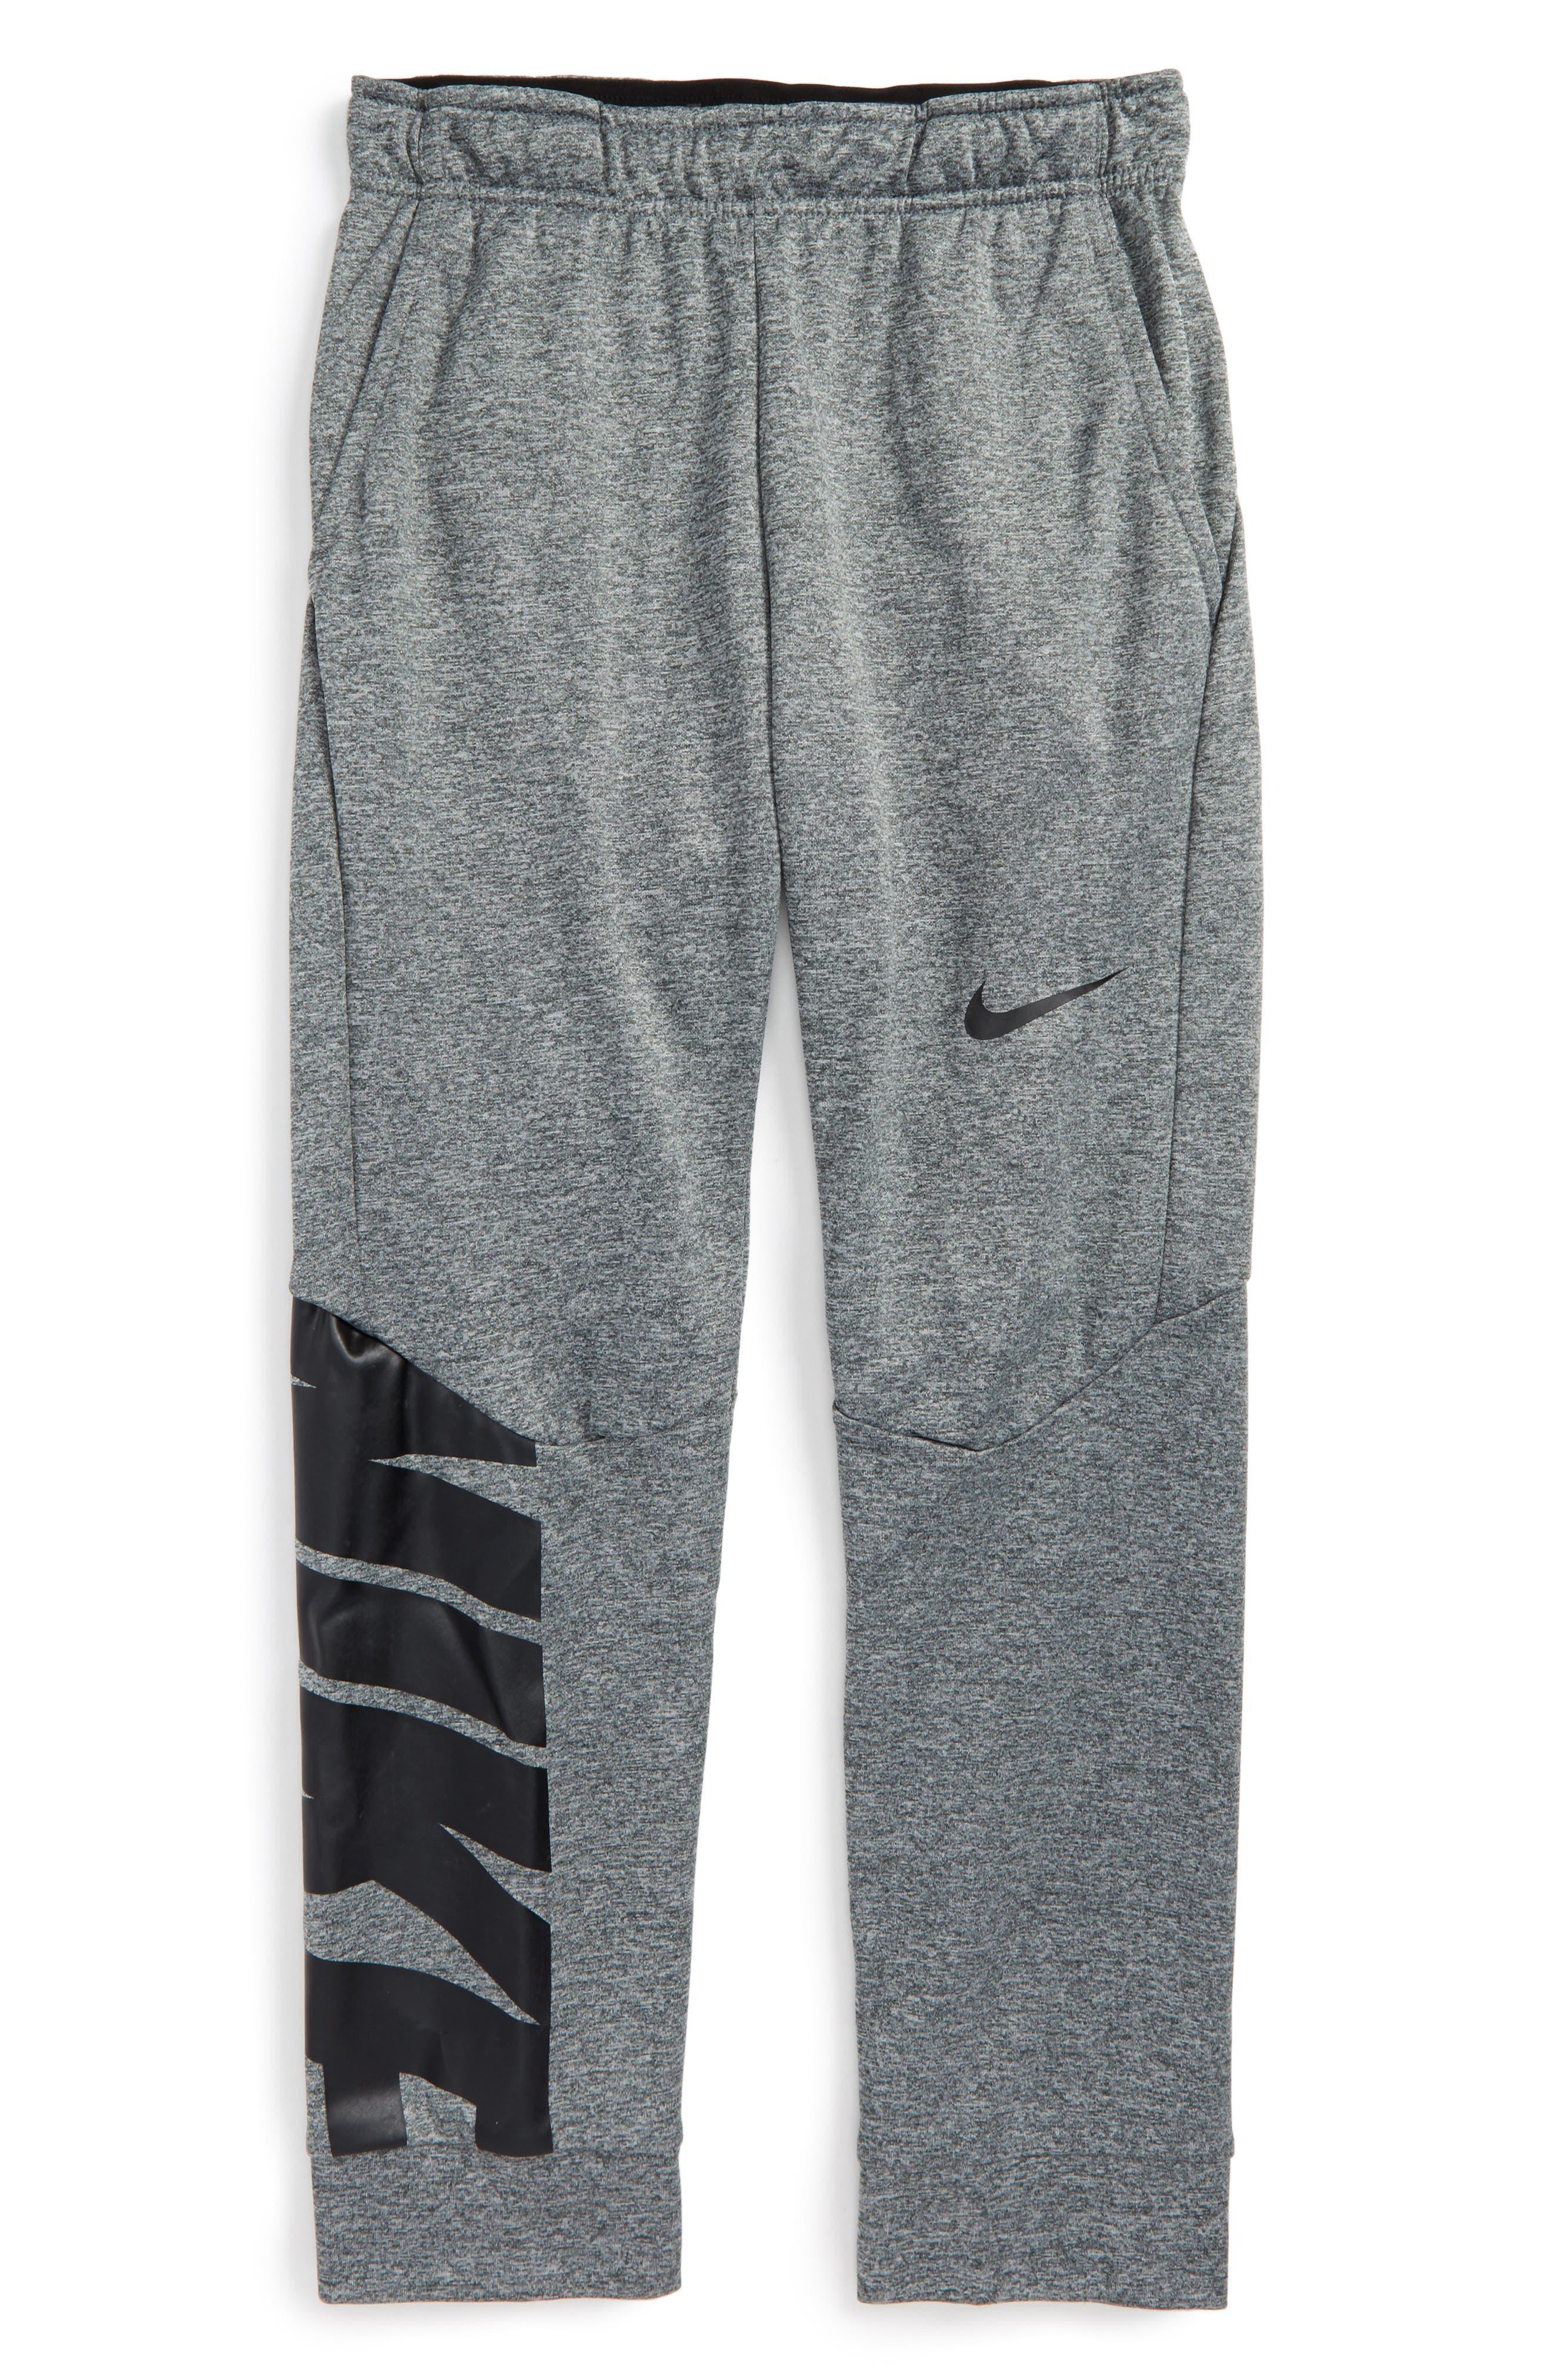 Alternate Image 1 Selected - Nike Therma-FIT GFX Fleece Jogger Pants (Little Boys & Big Boys)